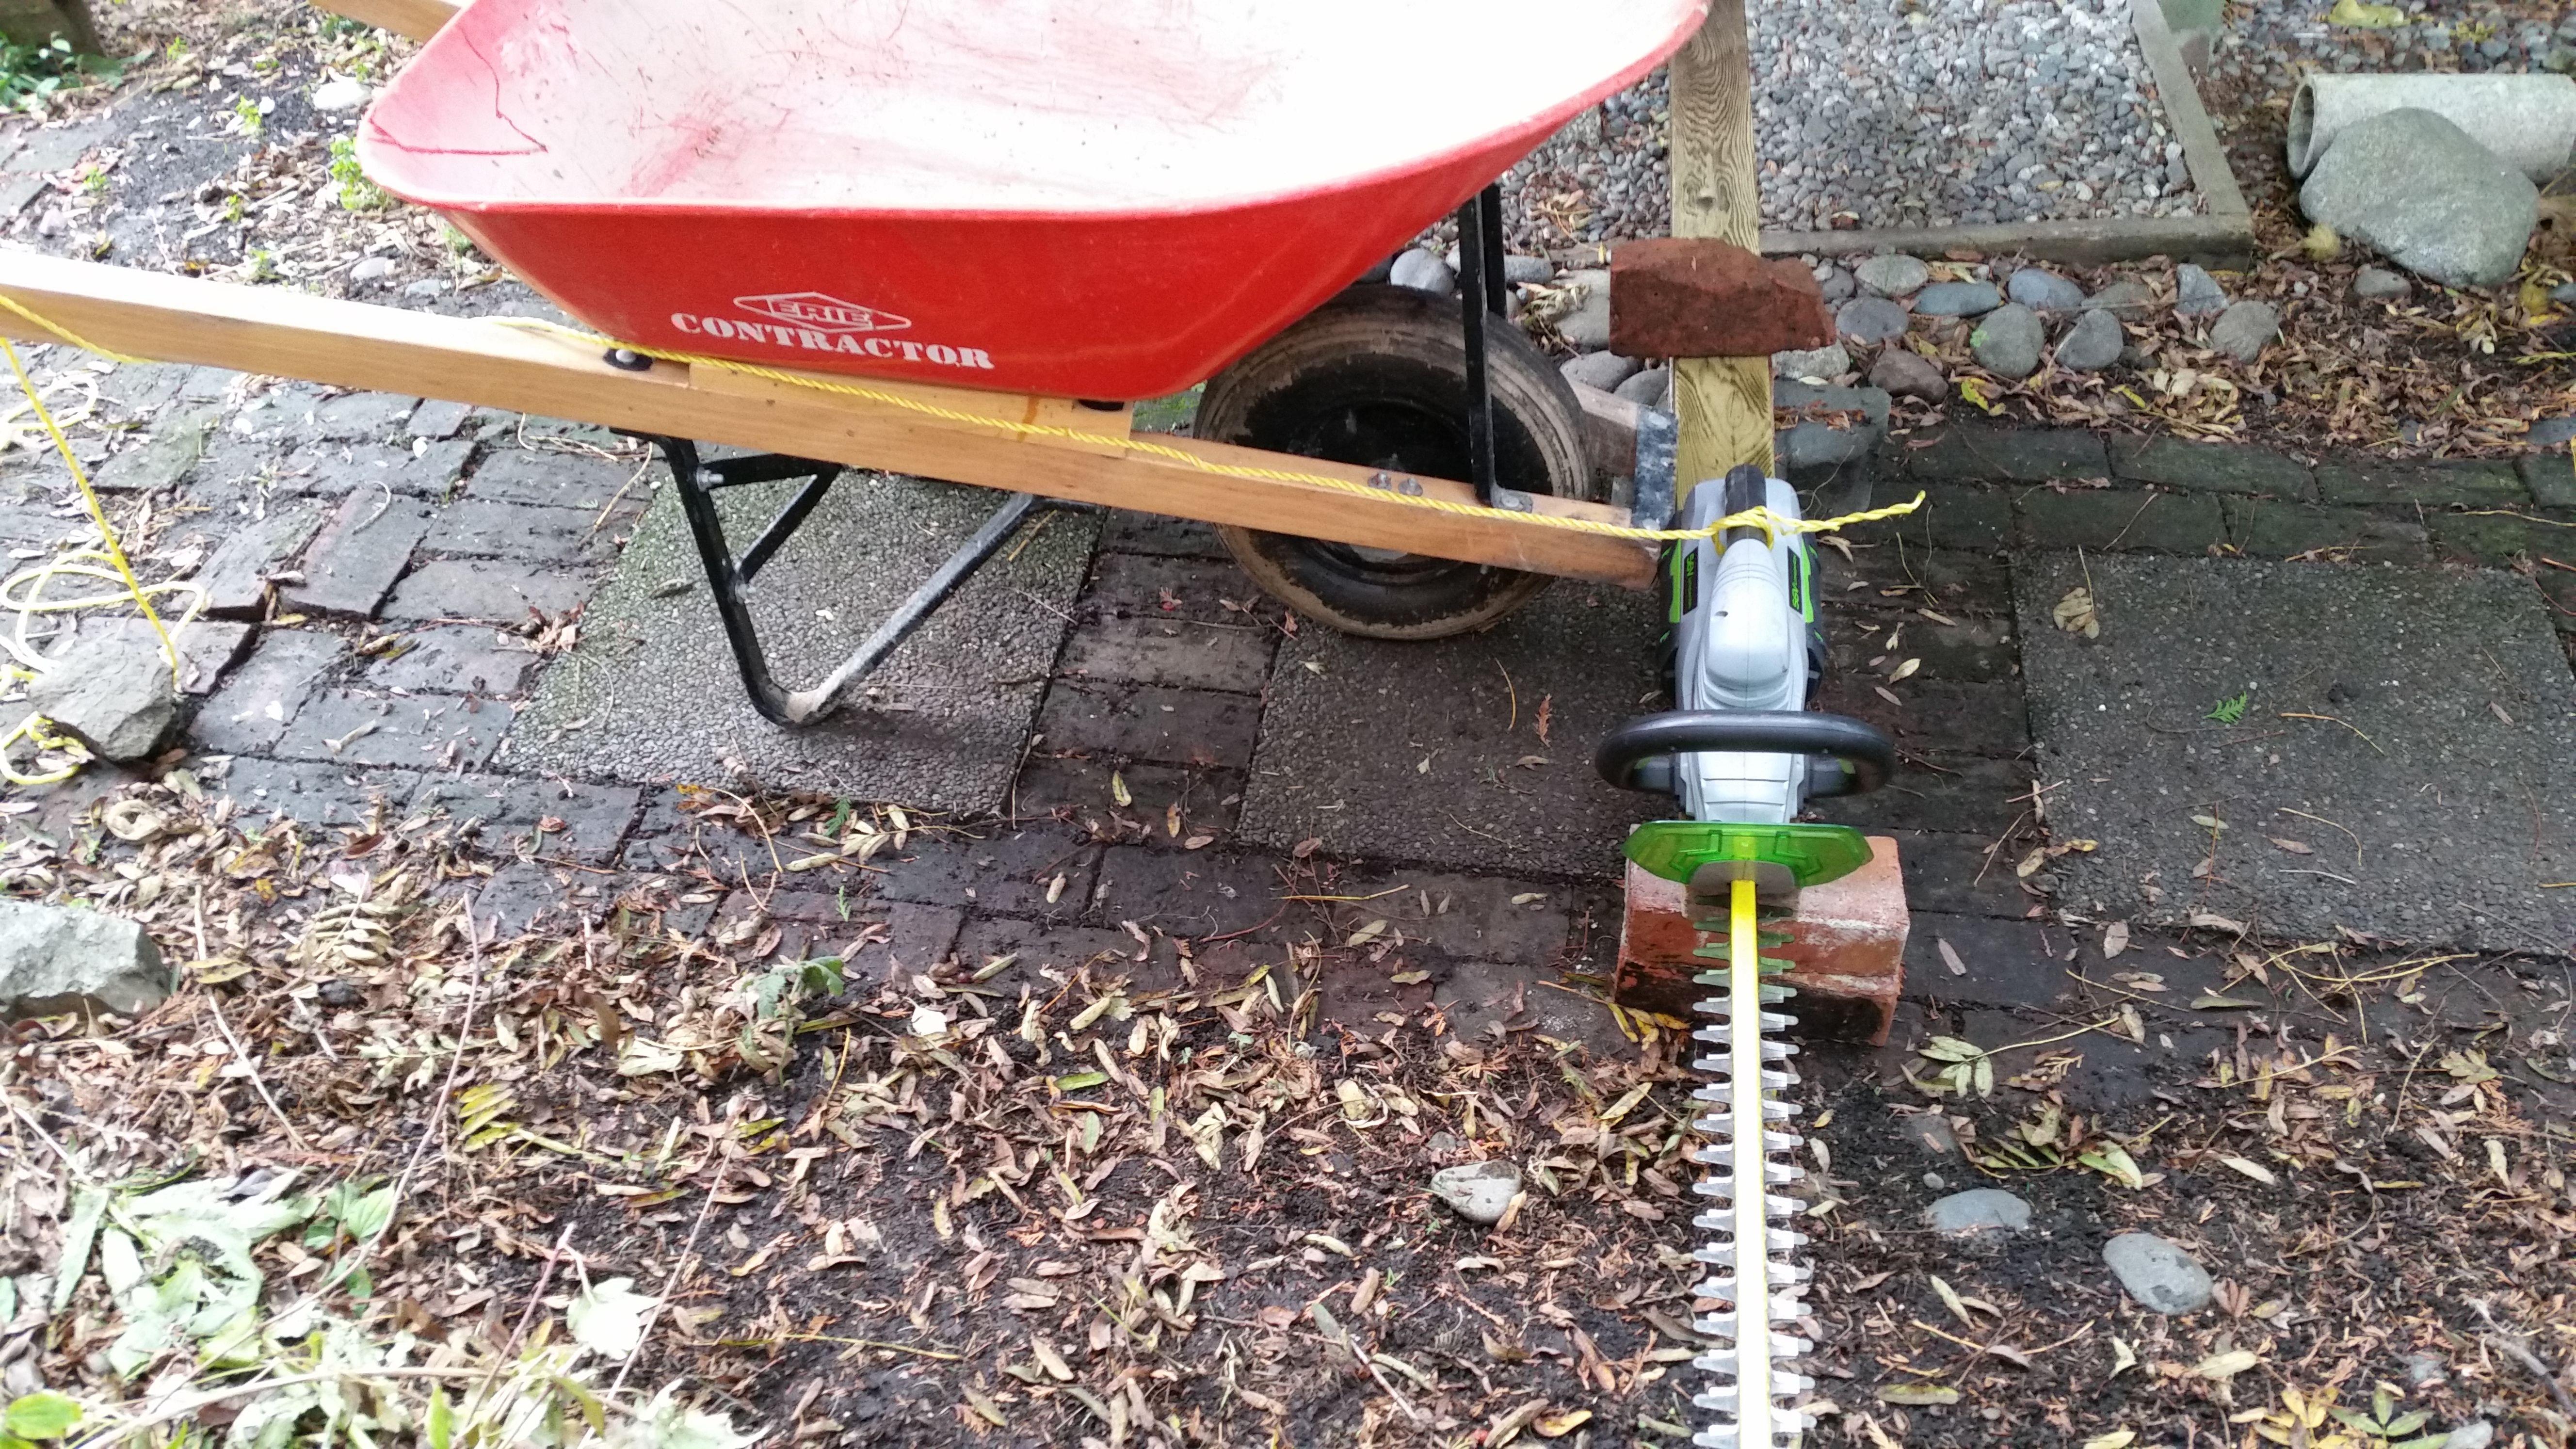 Diy wheelbarrow sickle bar mower homemade gas and electric - Sickle bar mower for garden tractor ...